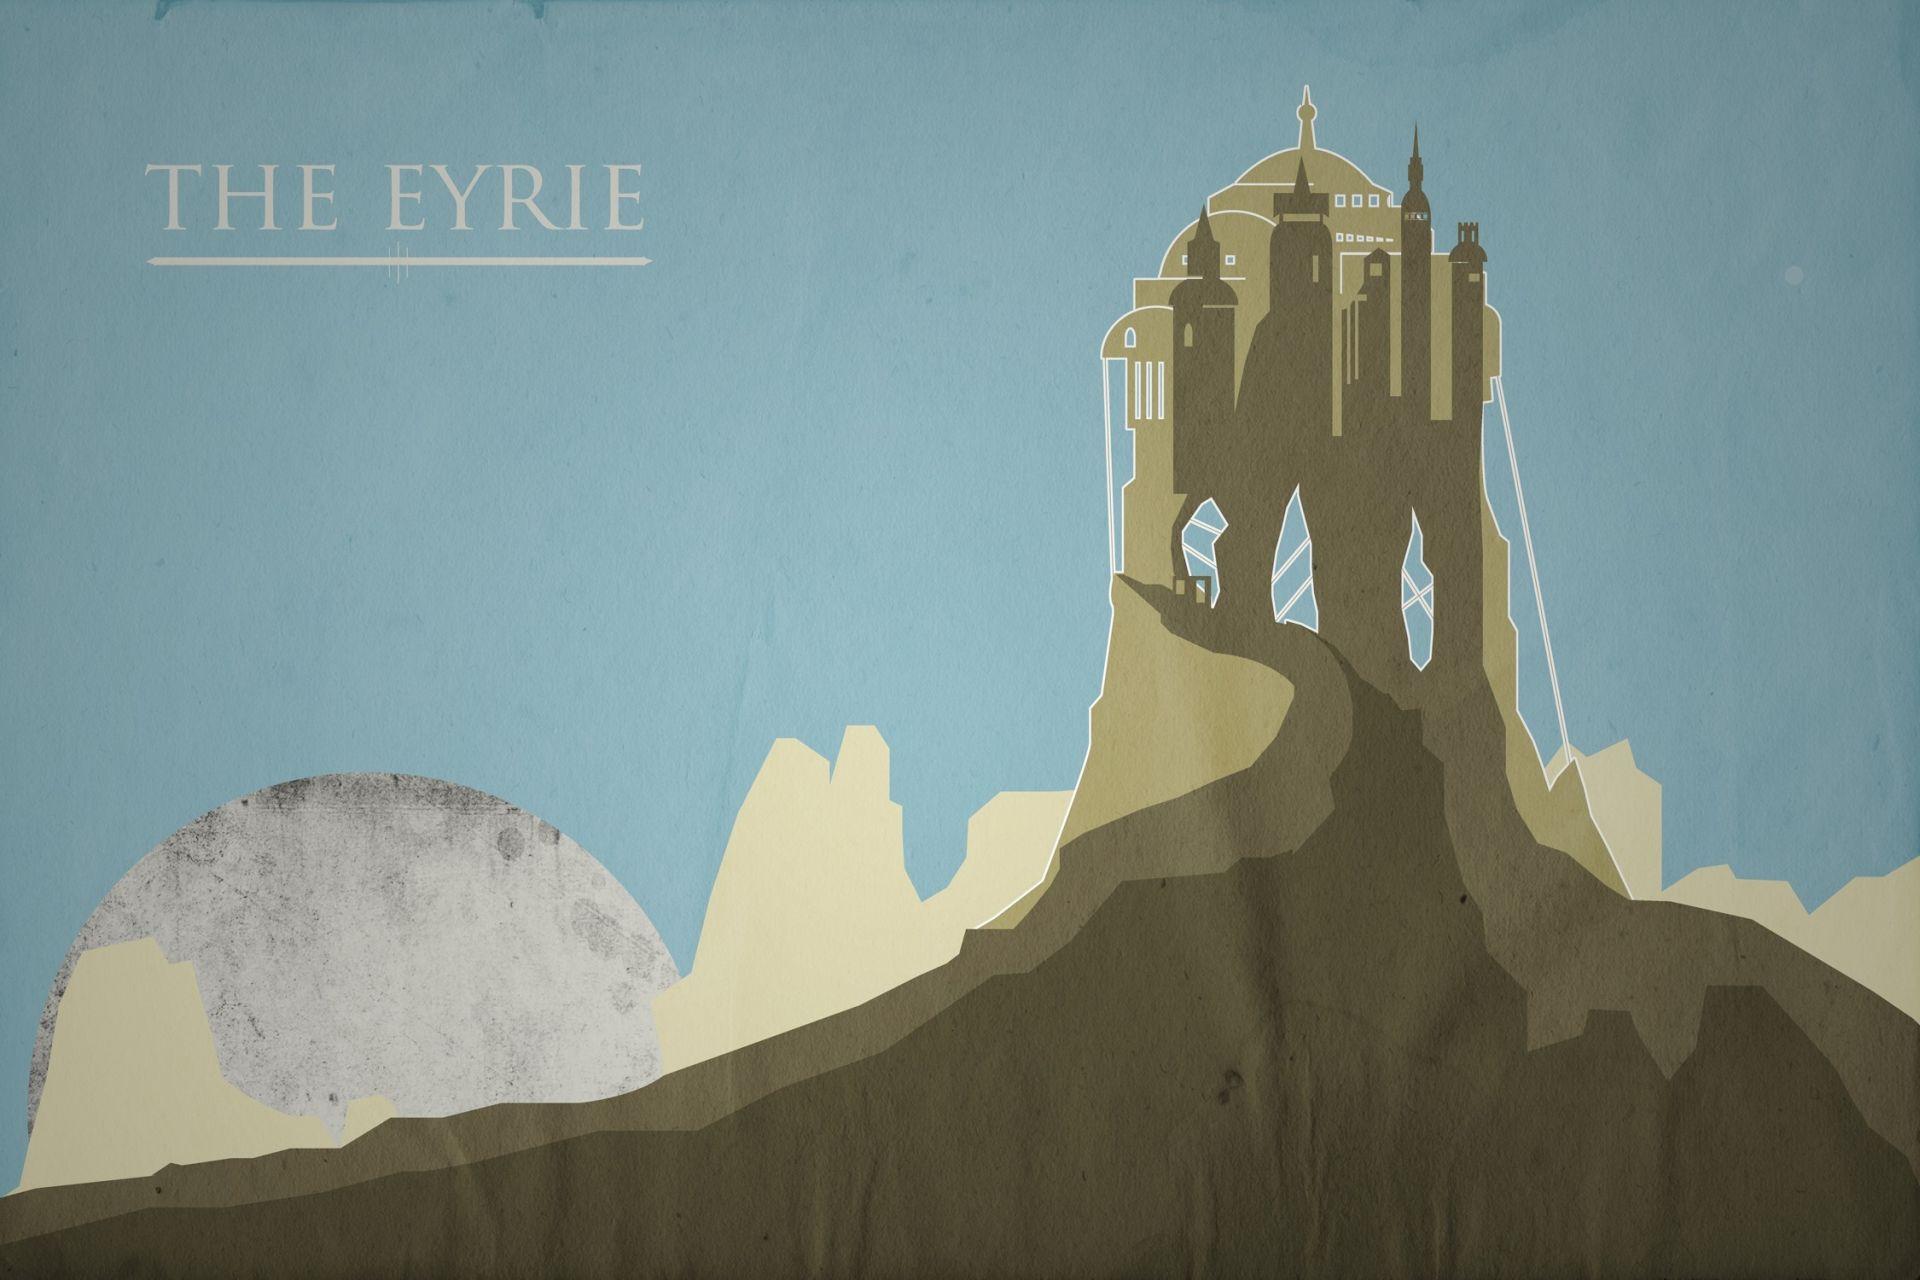 Game of Thrones minimal fan art